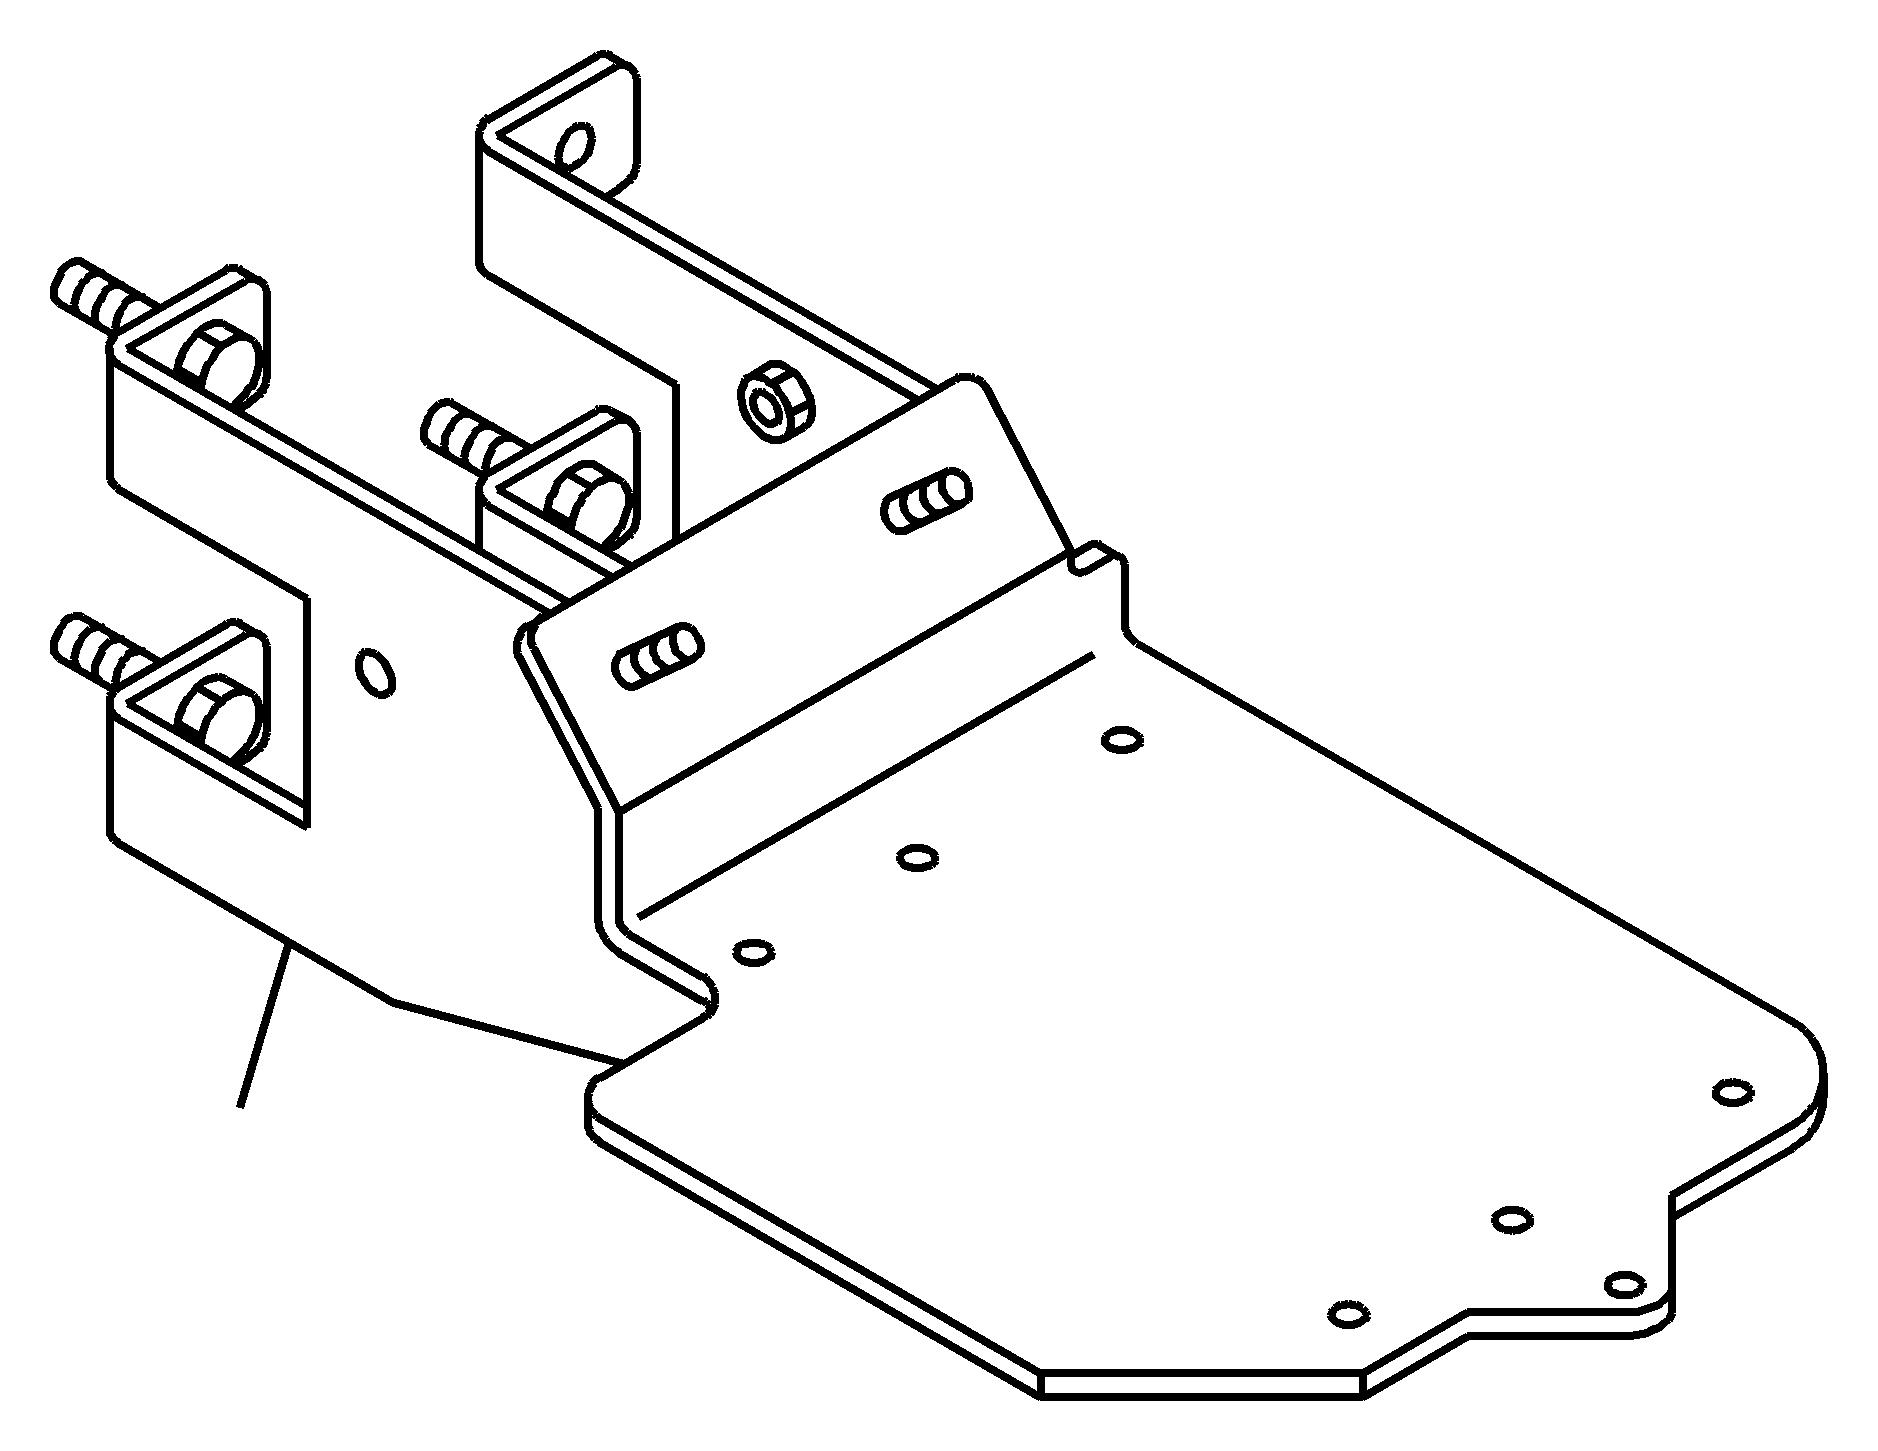 Diagram Isuzu Nqr Engine Diagram Full Version Hd Quality